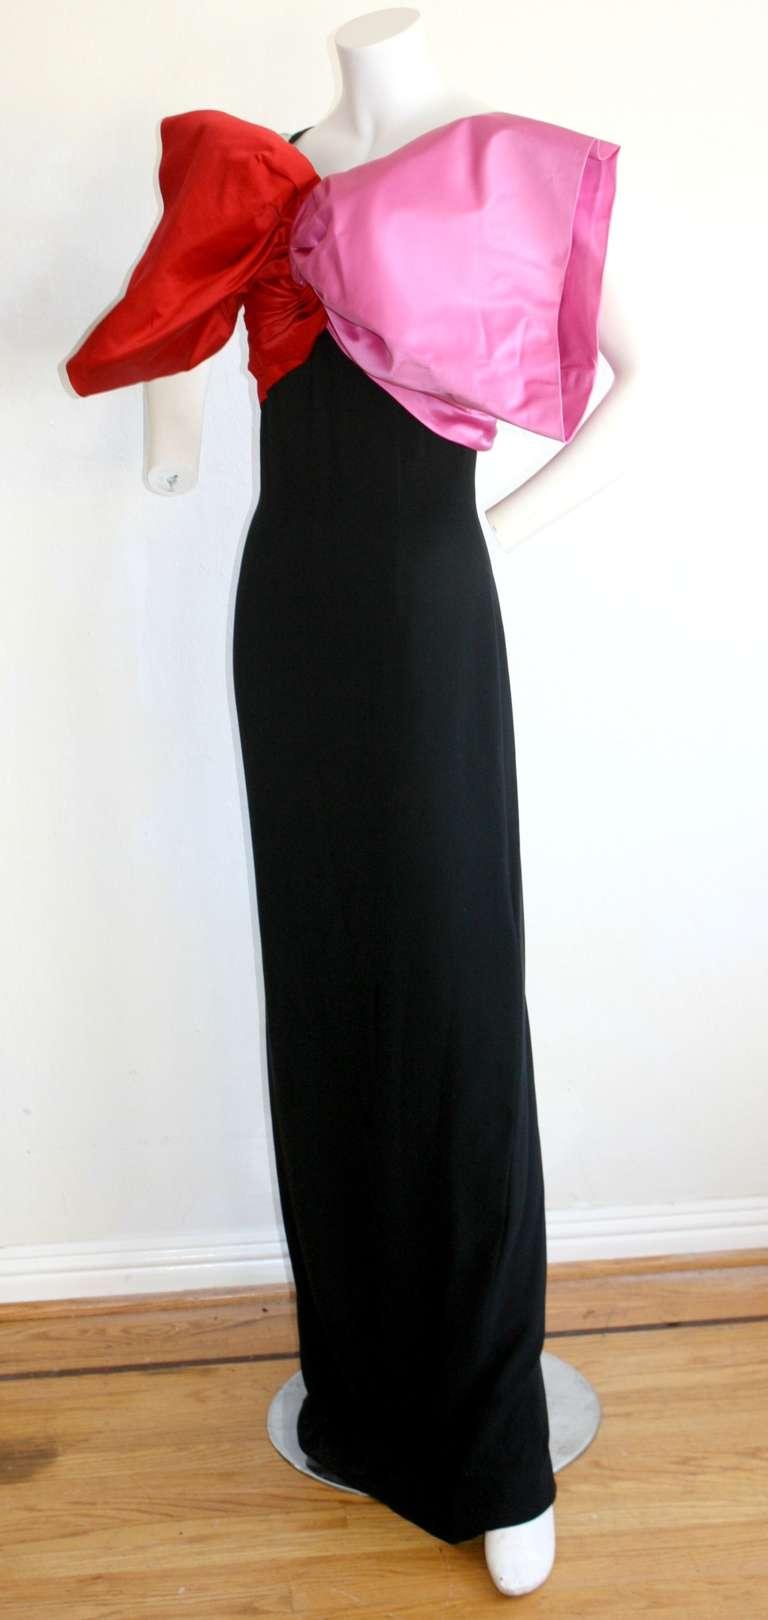 Stunning Vintage Bill Blass Gown Avant Garde Pink + Red Black Bow Dress / Gown 2